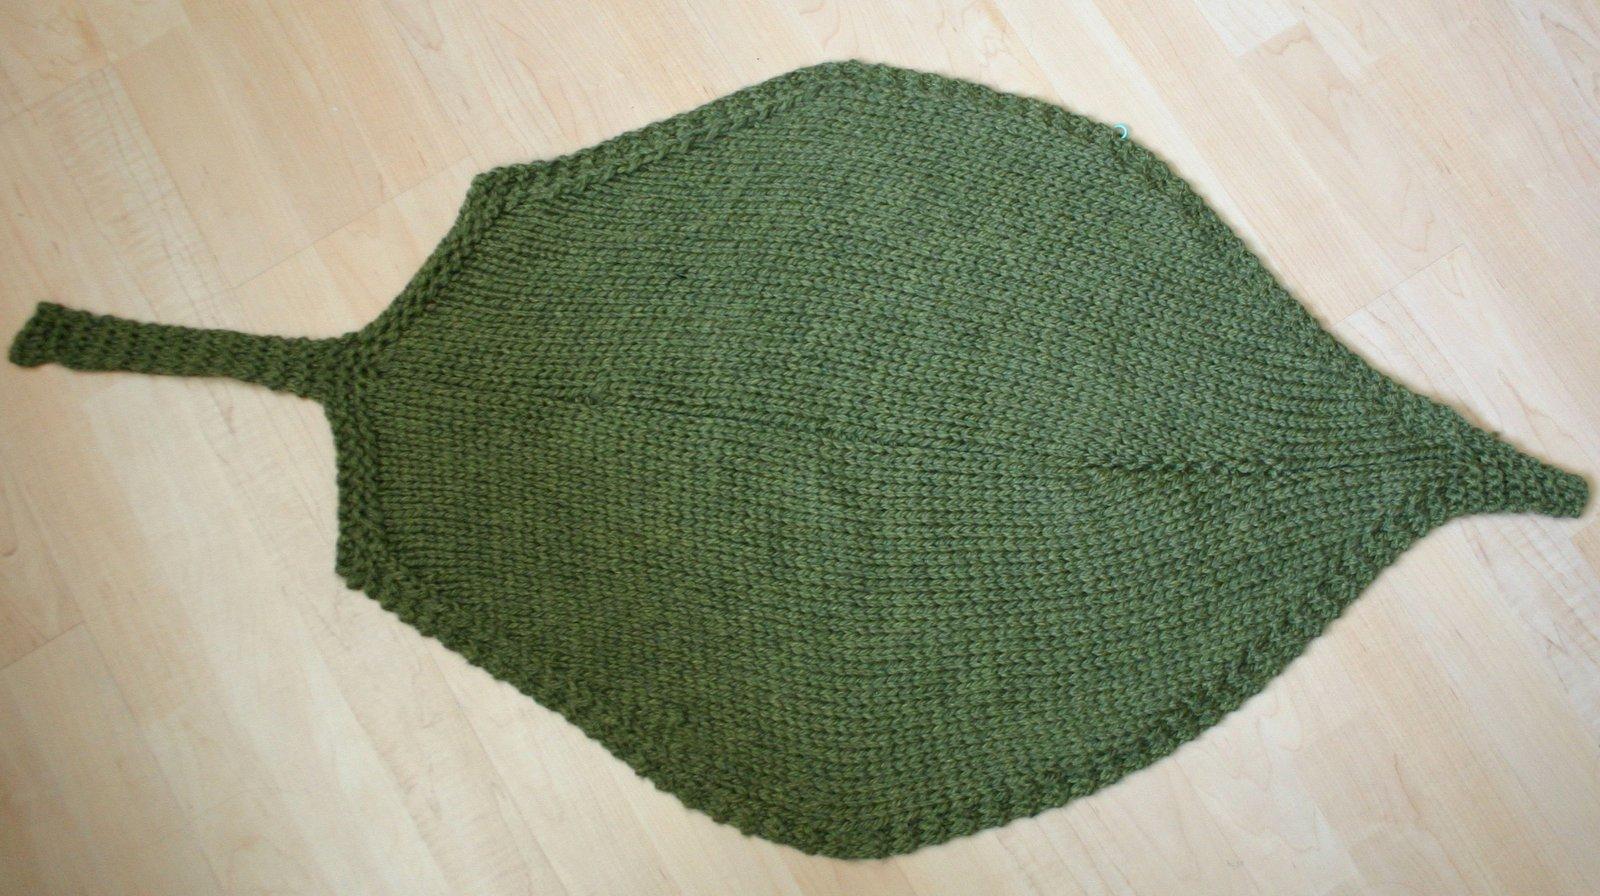 d8d641e383b5 LavenderSheep s Fiber Garden Blog  Leaf Blanket